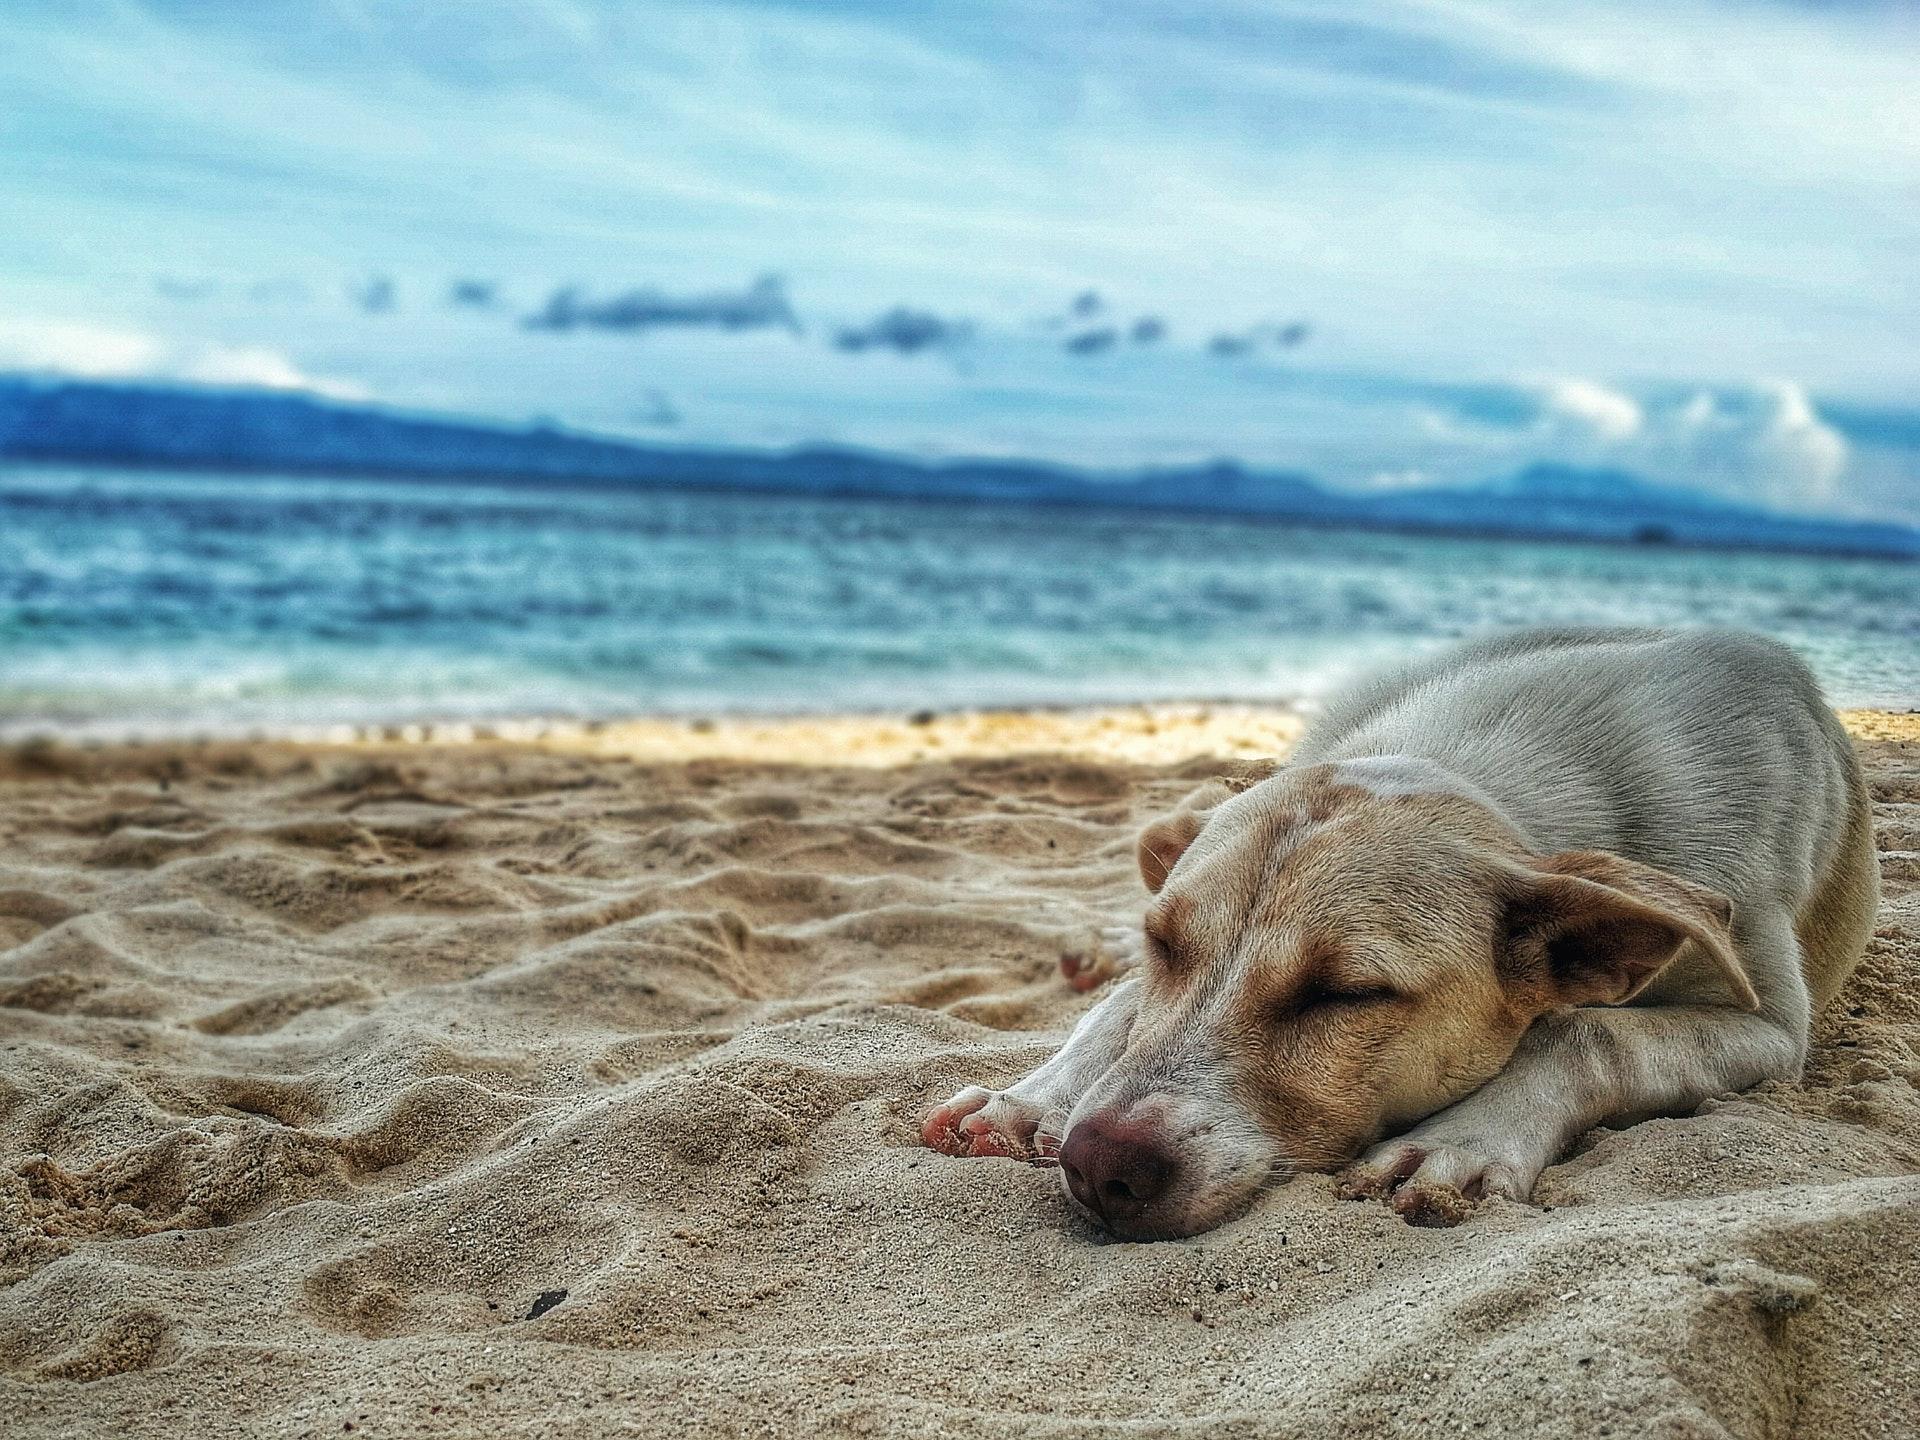 dog napping on the beach at sunset, dog arthritis